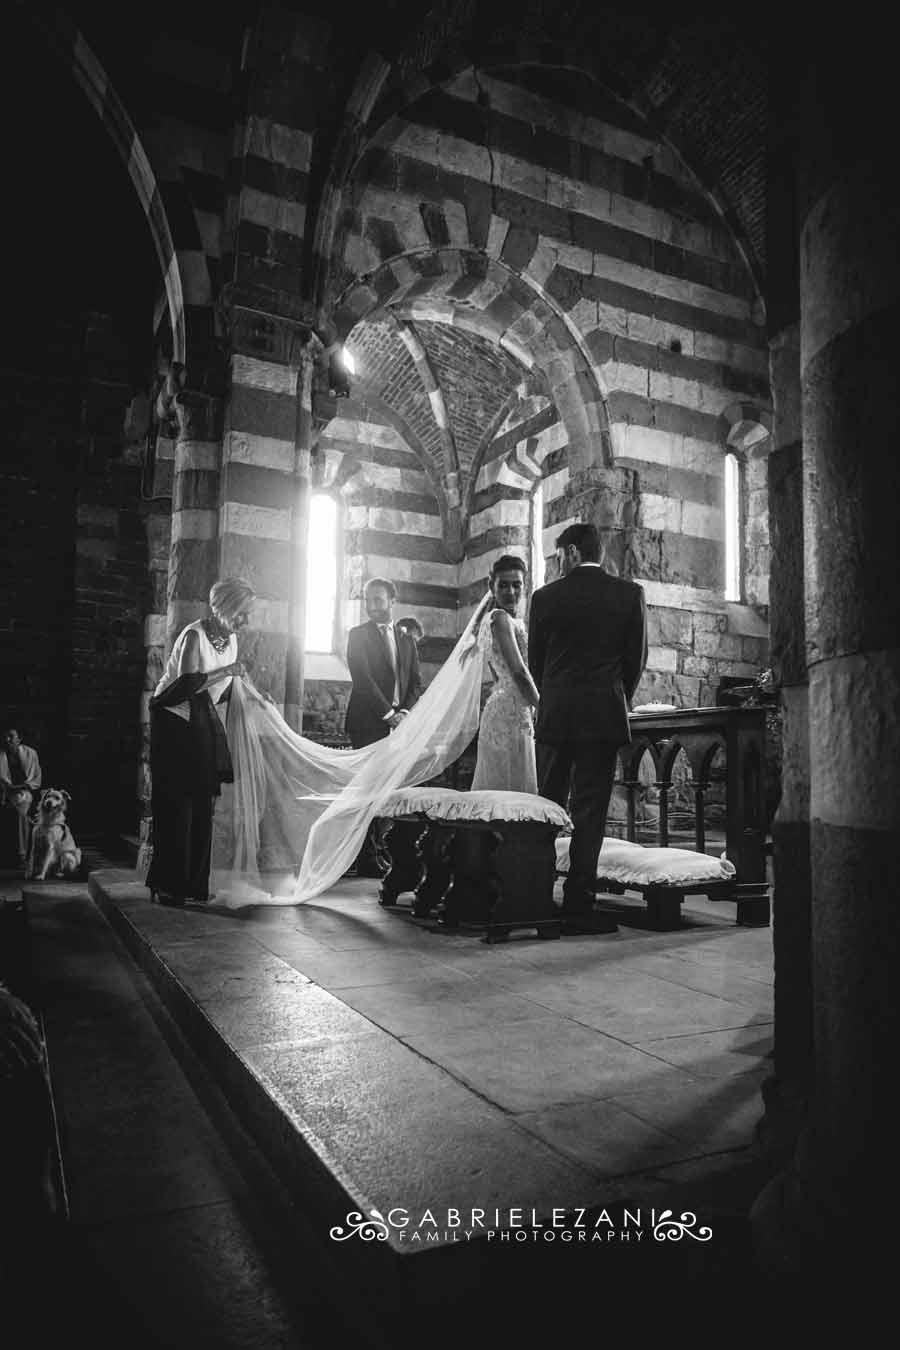 foto matrimonio portovenere gabriele zani chiesa